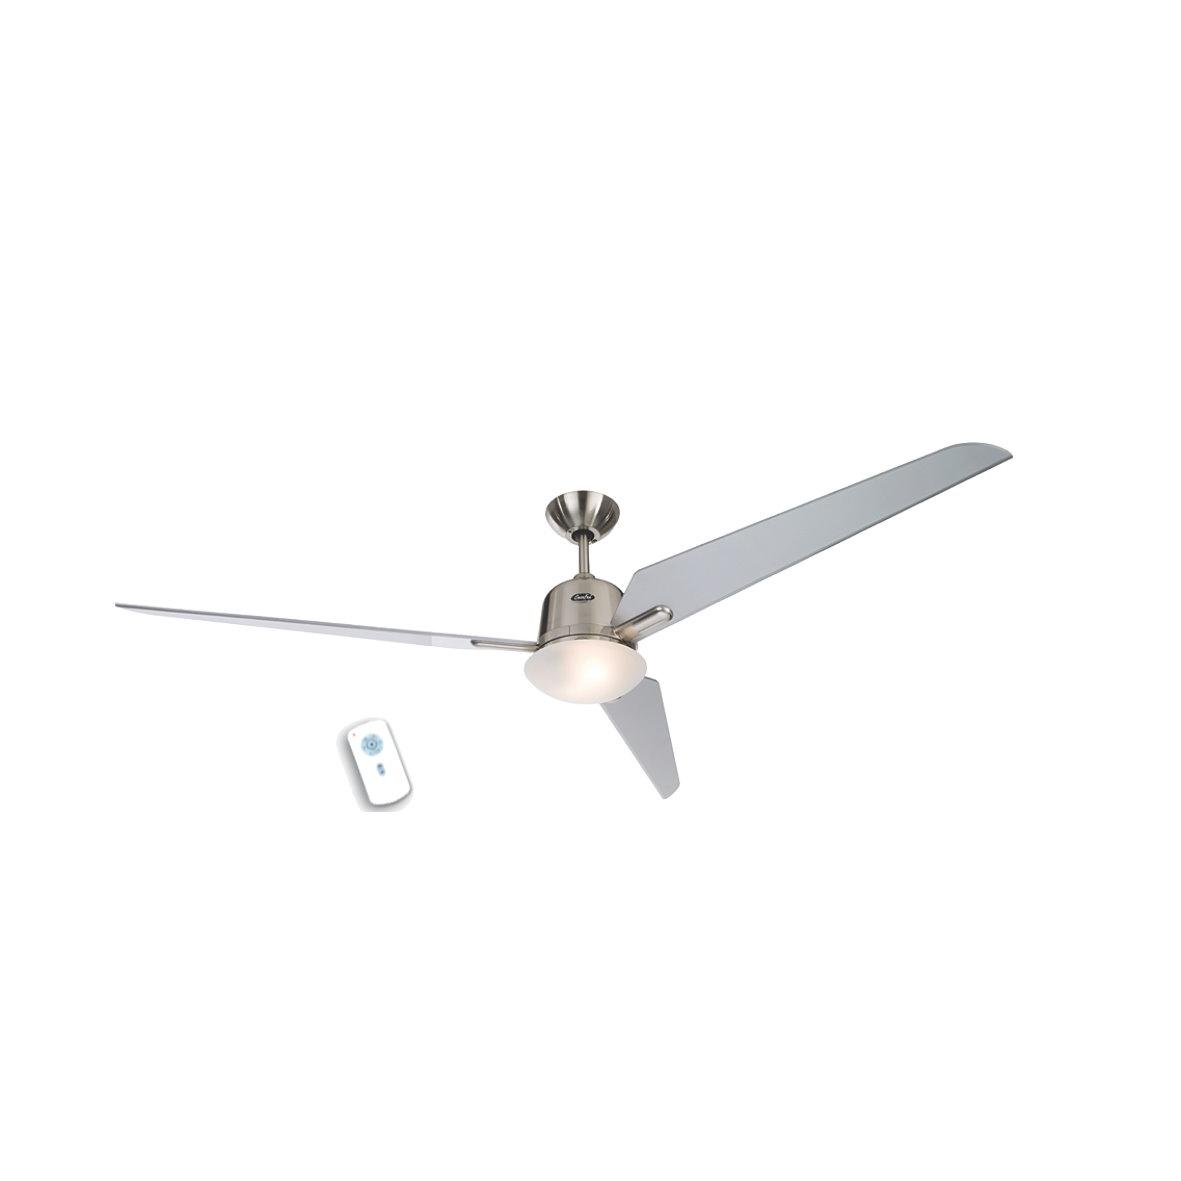 casafan deckenventilator decke ventilator eco beleuchtung leuchte ceiling fan ebay. Black Bedroom Furniture Sets. Home Design Ideas